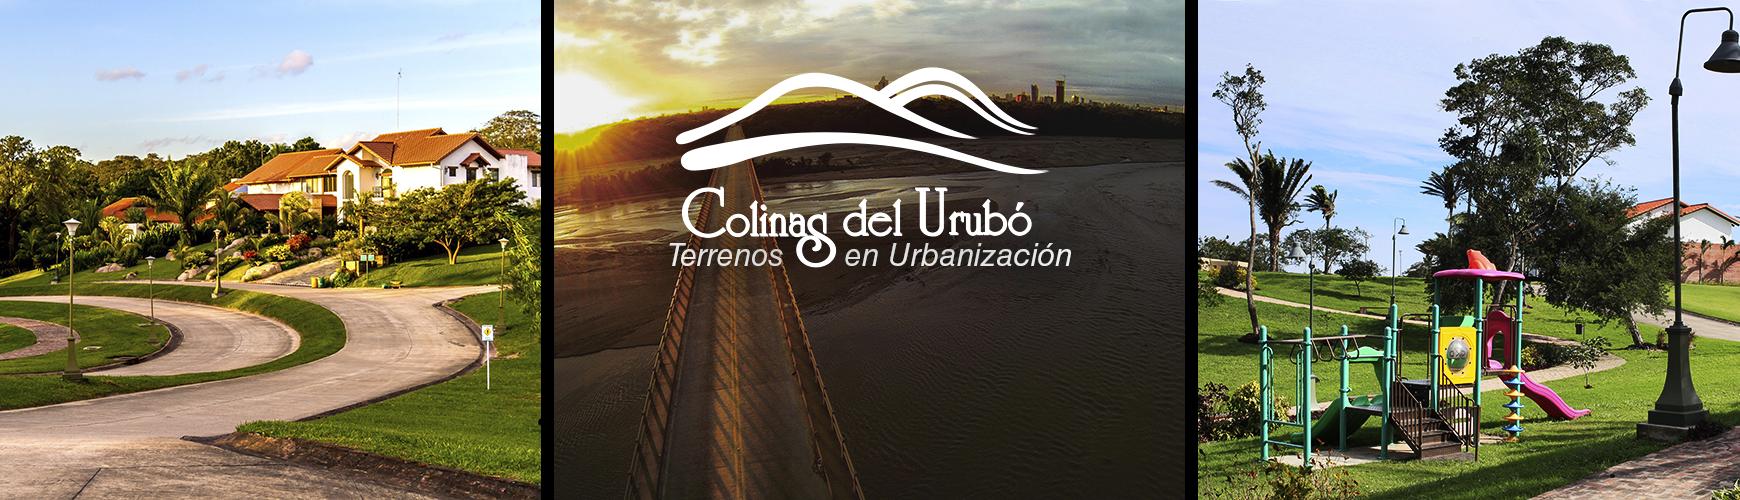 Colinas del Urubó Foto 1